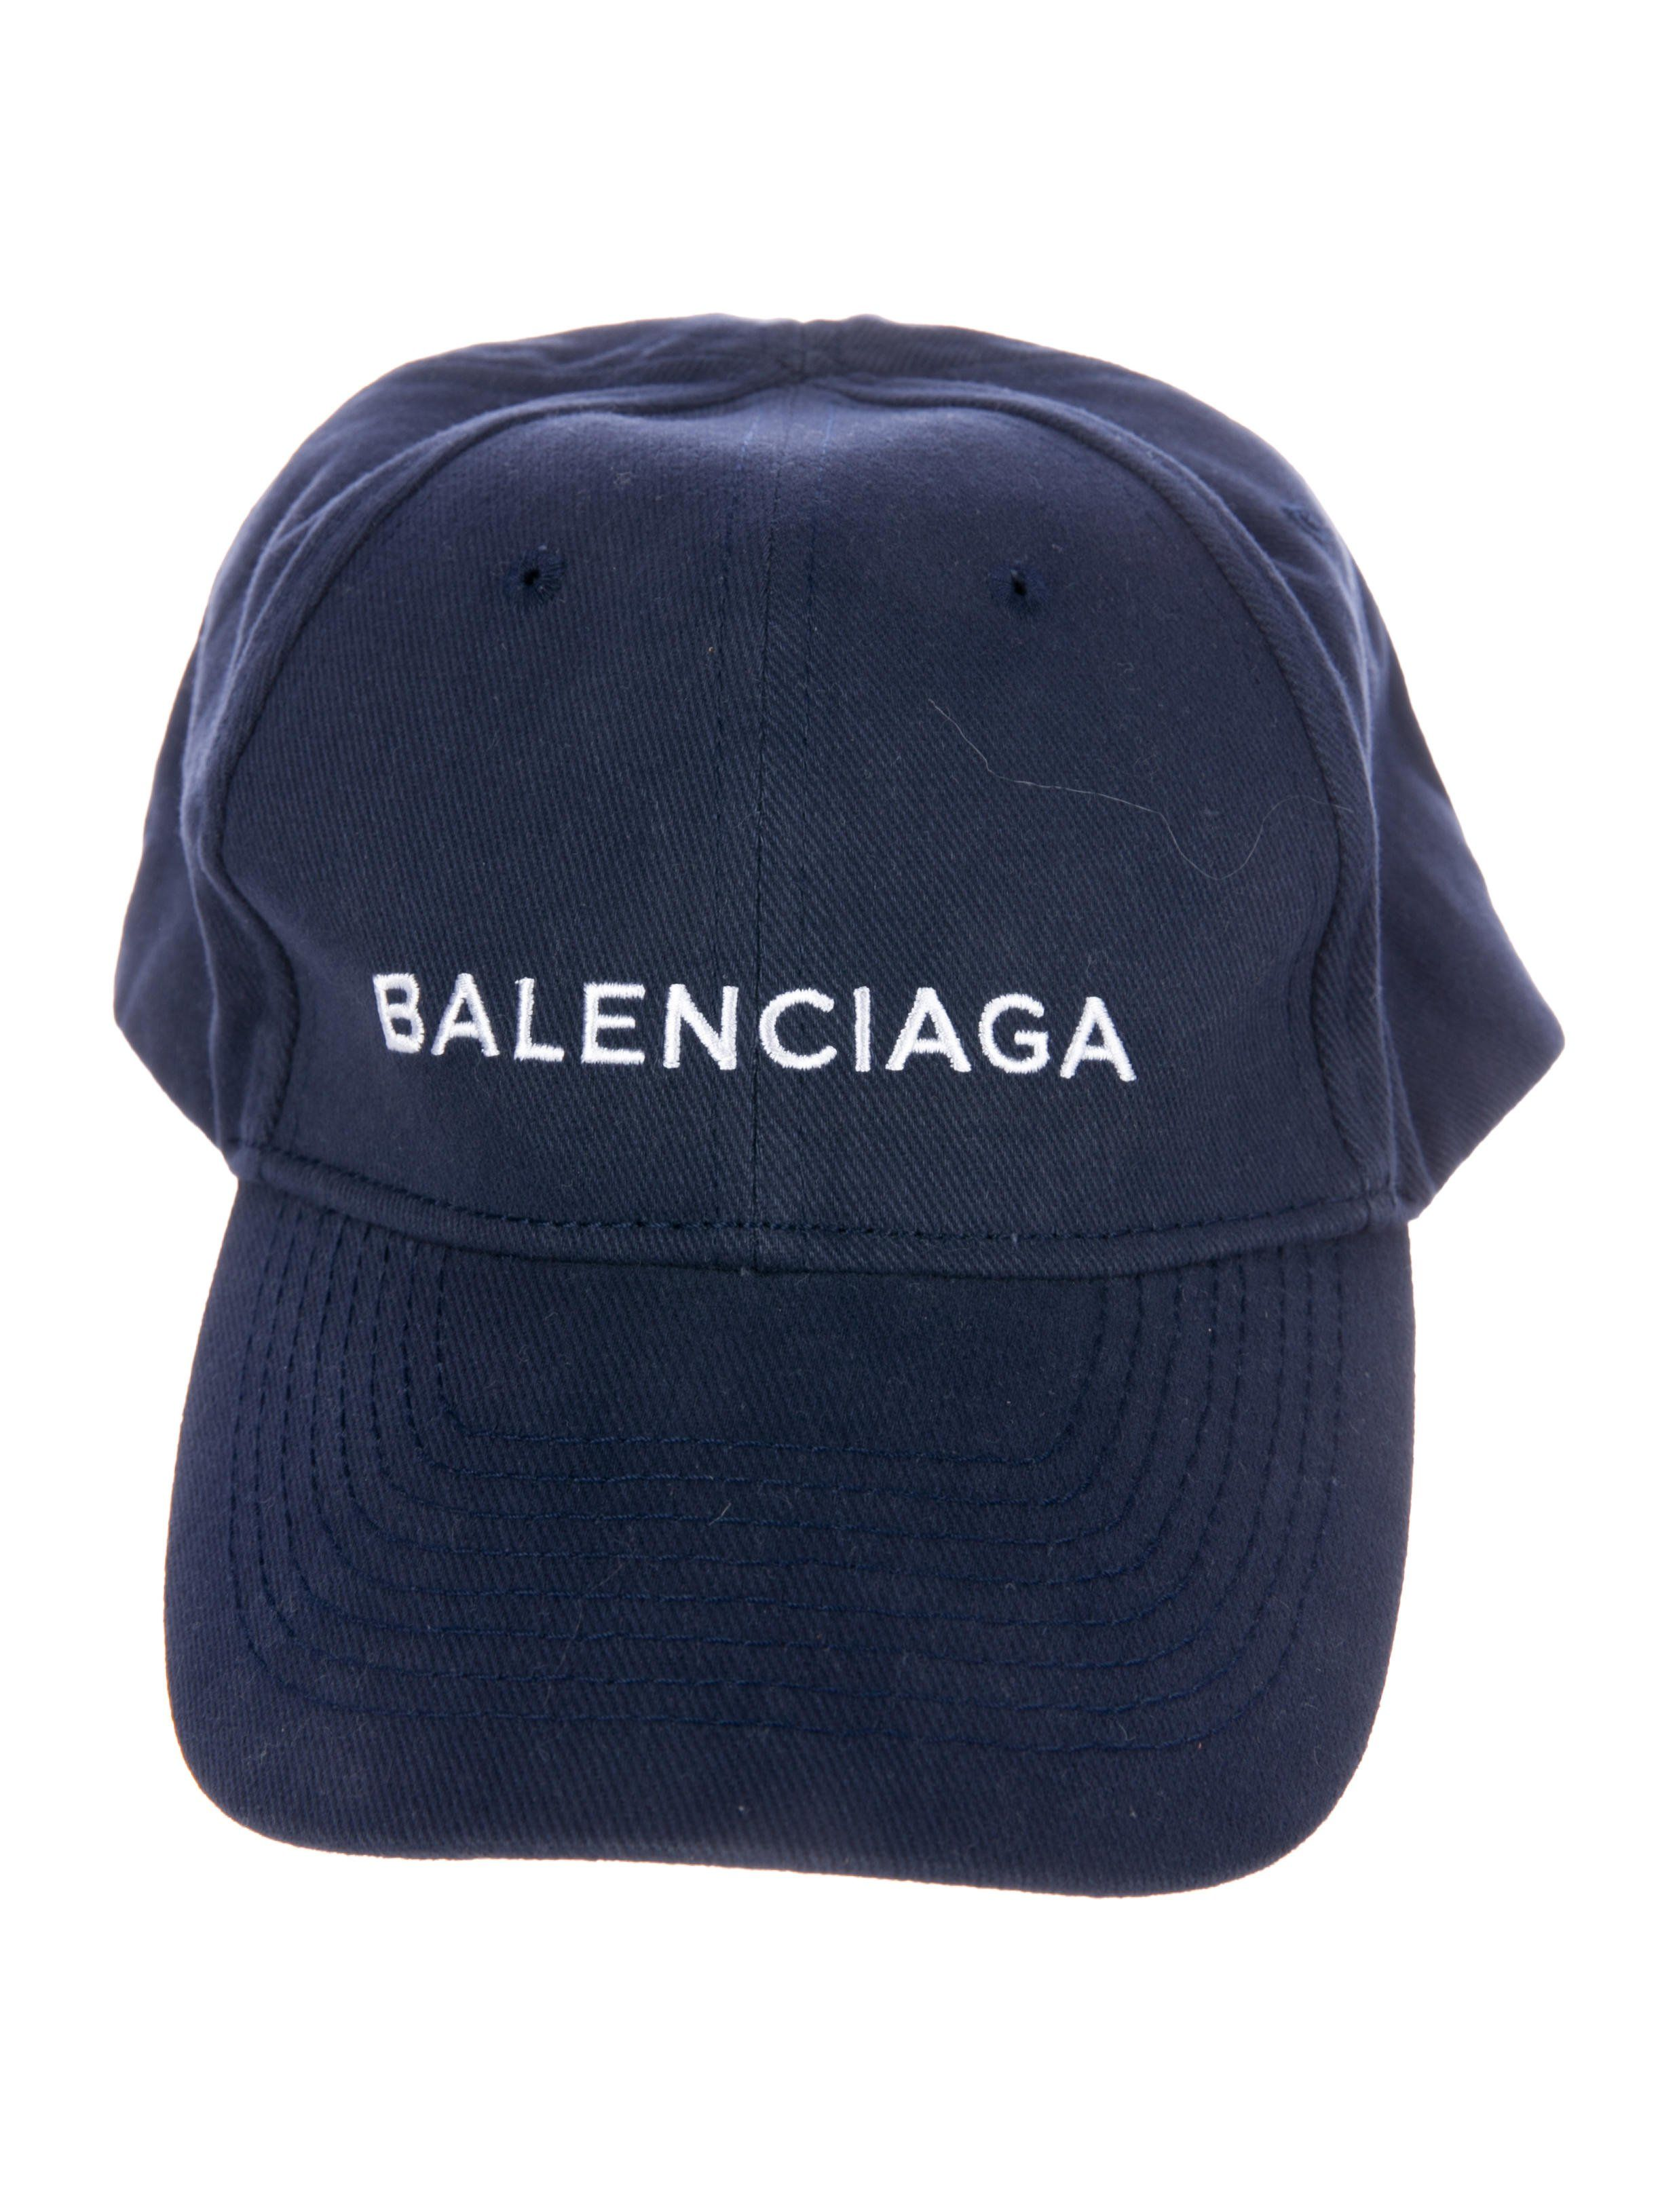 c9391daa98f Navy Balenciaga baseball cap with embroidered logo at front and gunmetal  adjustable snap closure at back. Designer size L. Includes dust bag.